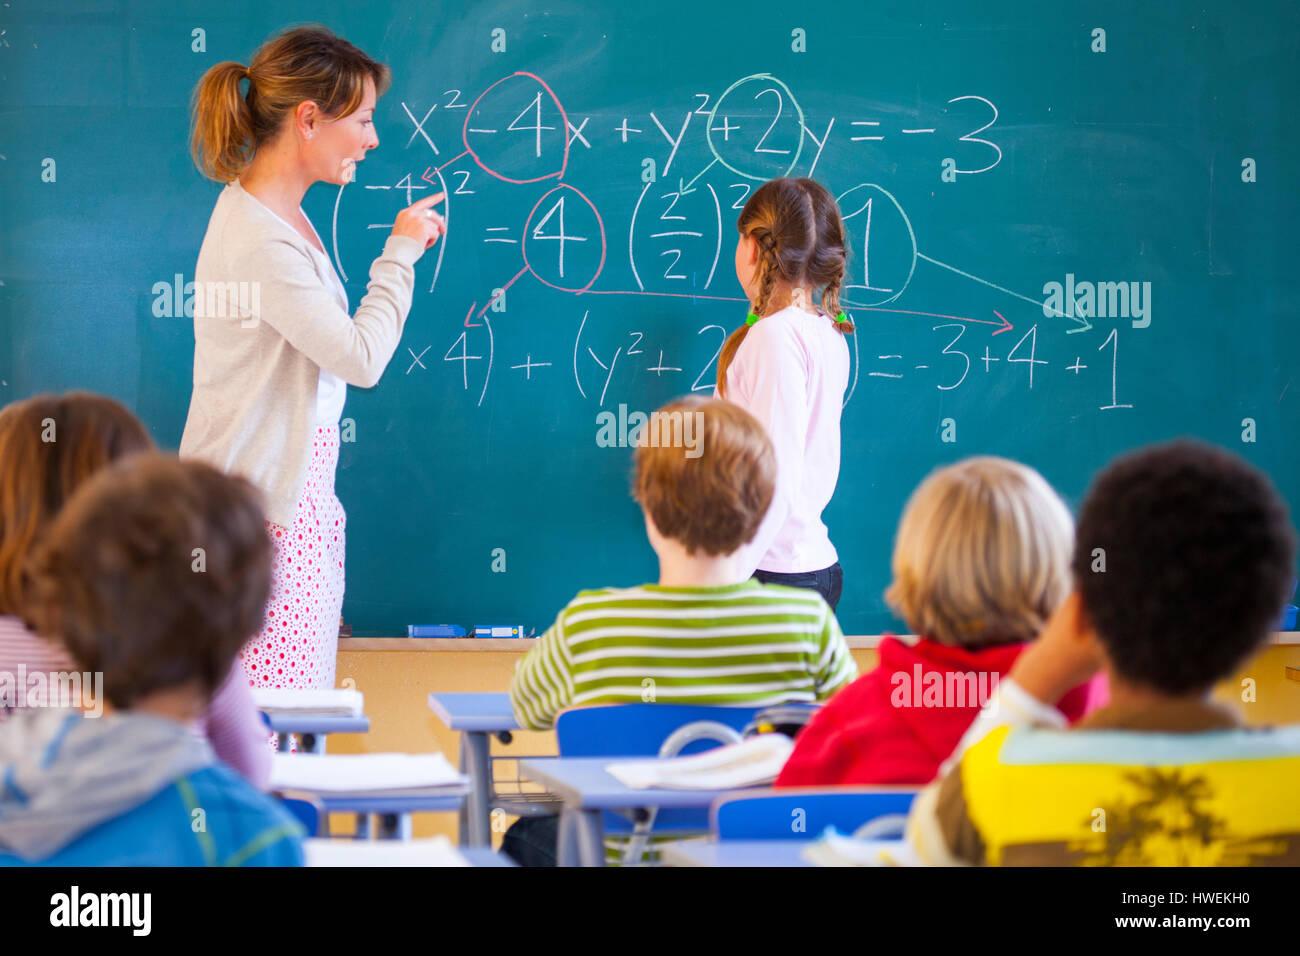 Primary school teacher explaining equation on classroom blackboard - Stock Image